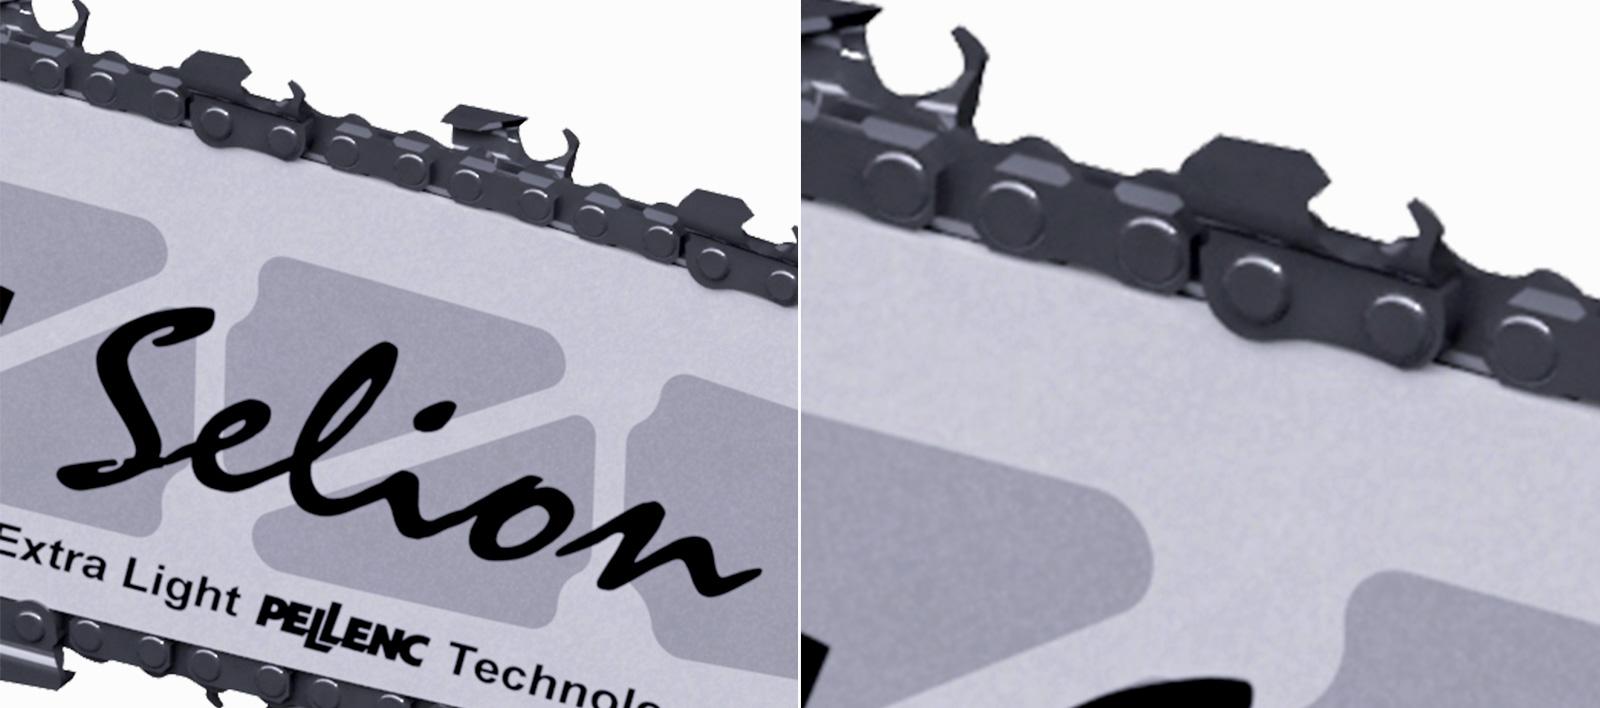 Selion-C21-HD-Frein-de-chaine